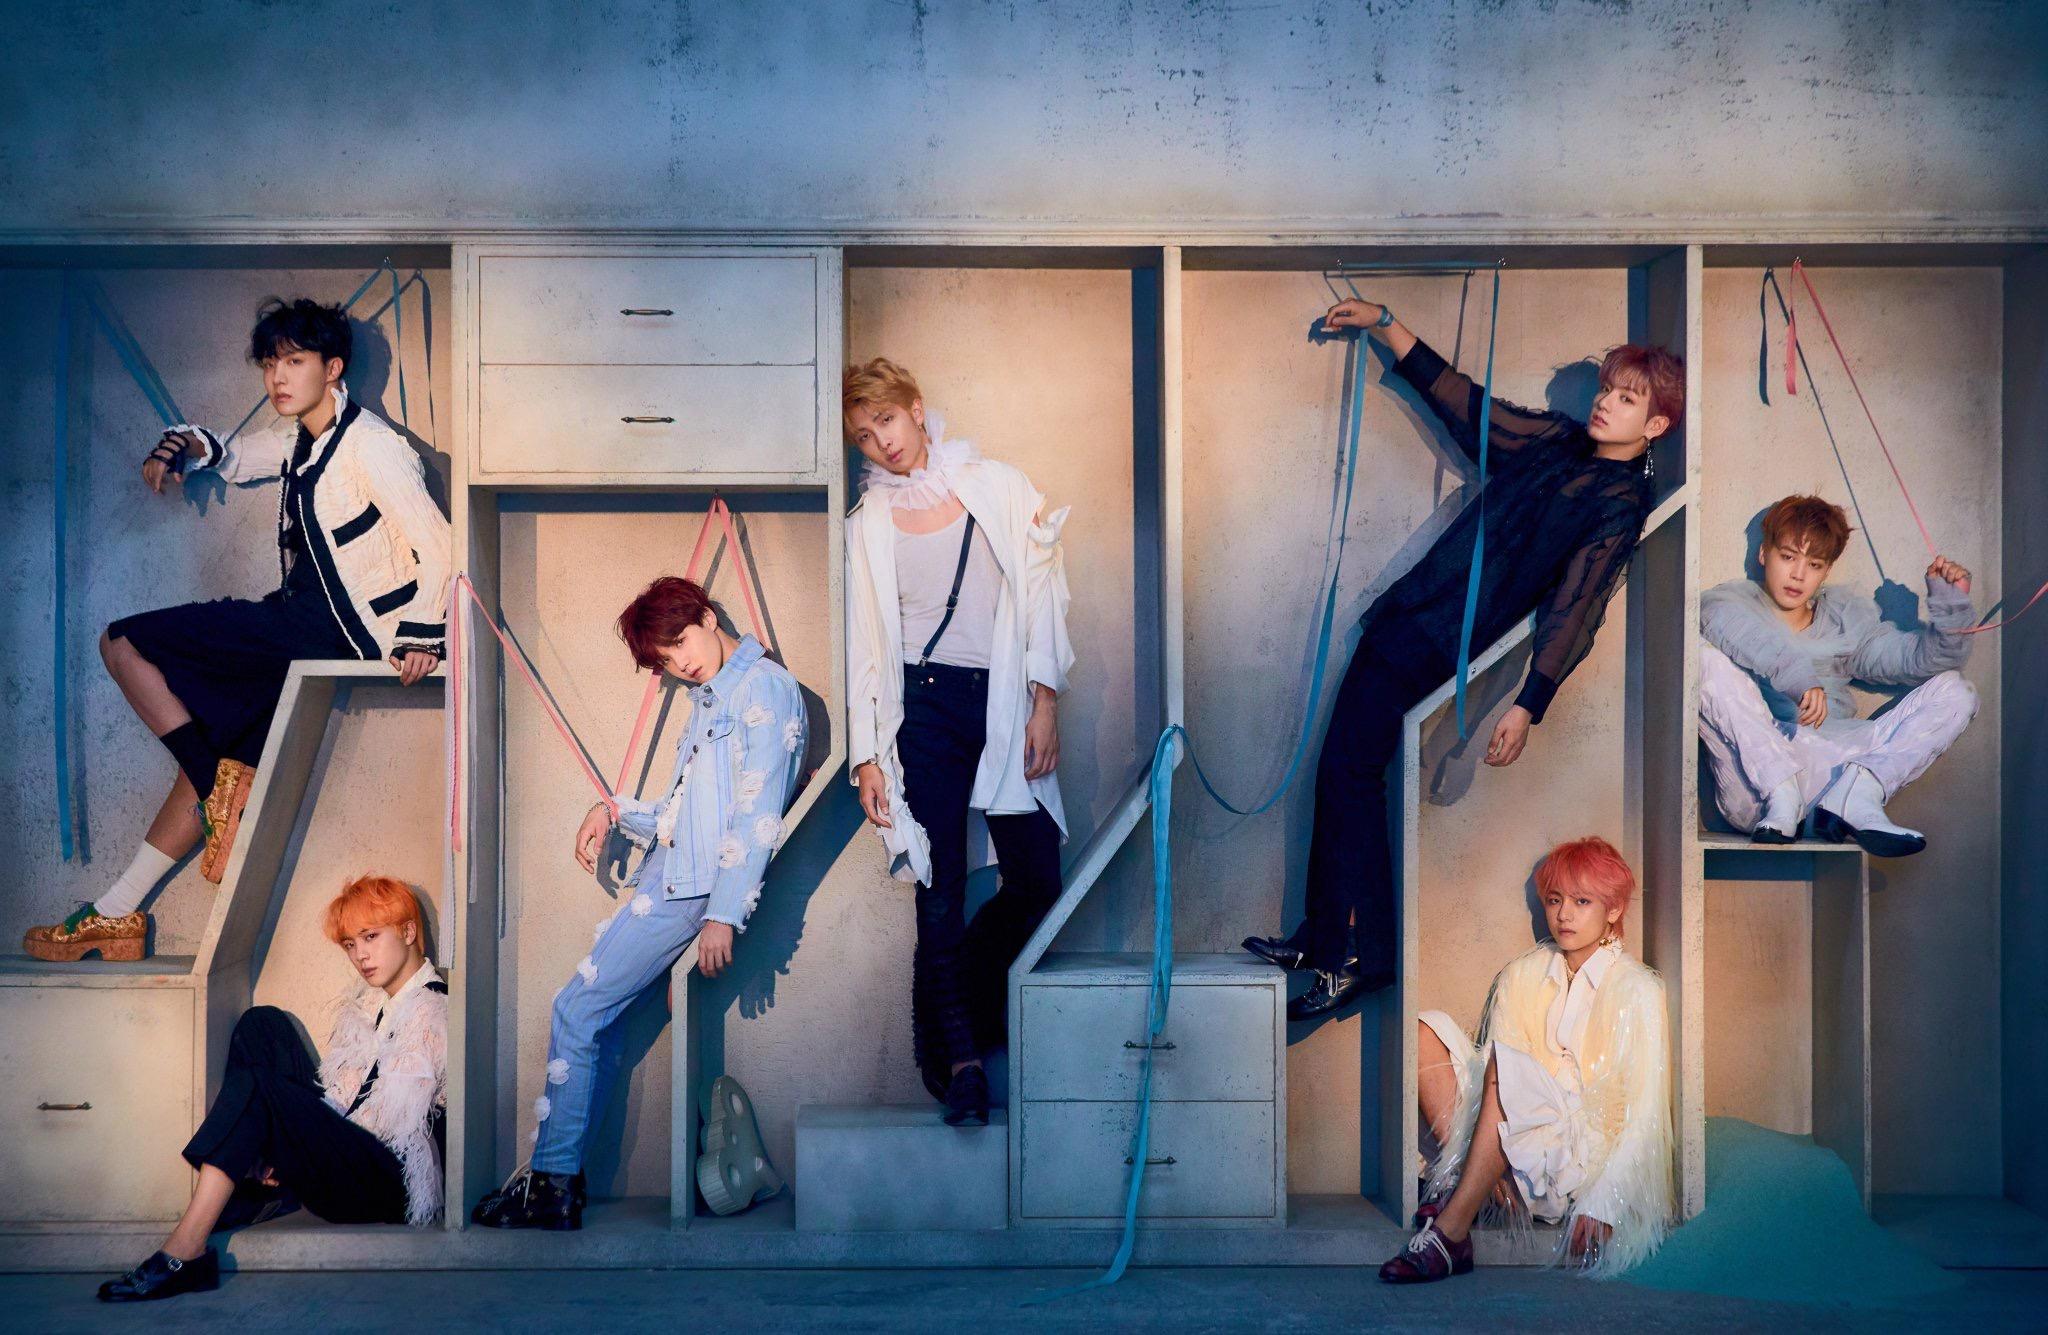 Bts 日本 テレビ 出演 予定 スケジュール | BTS JAPAN